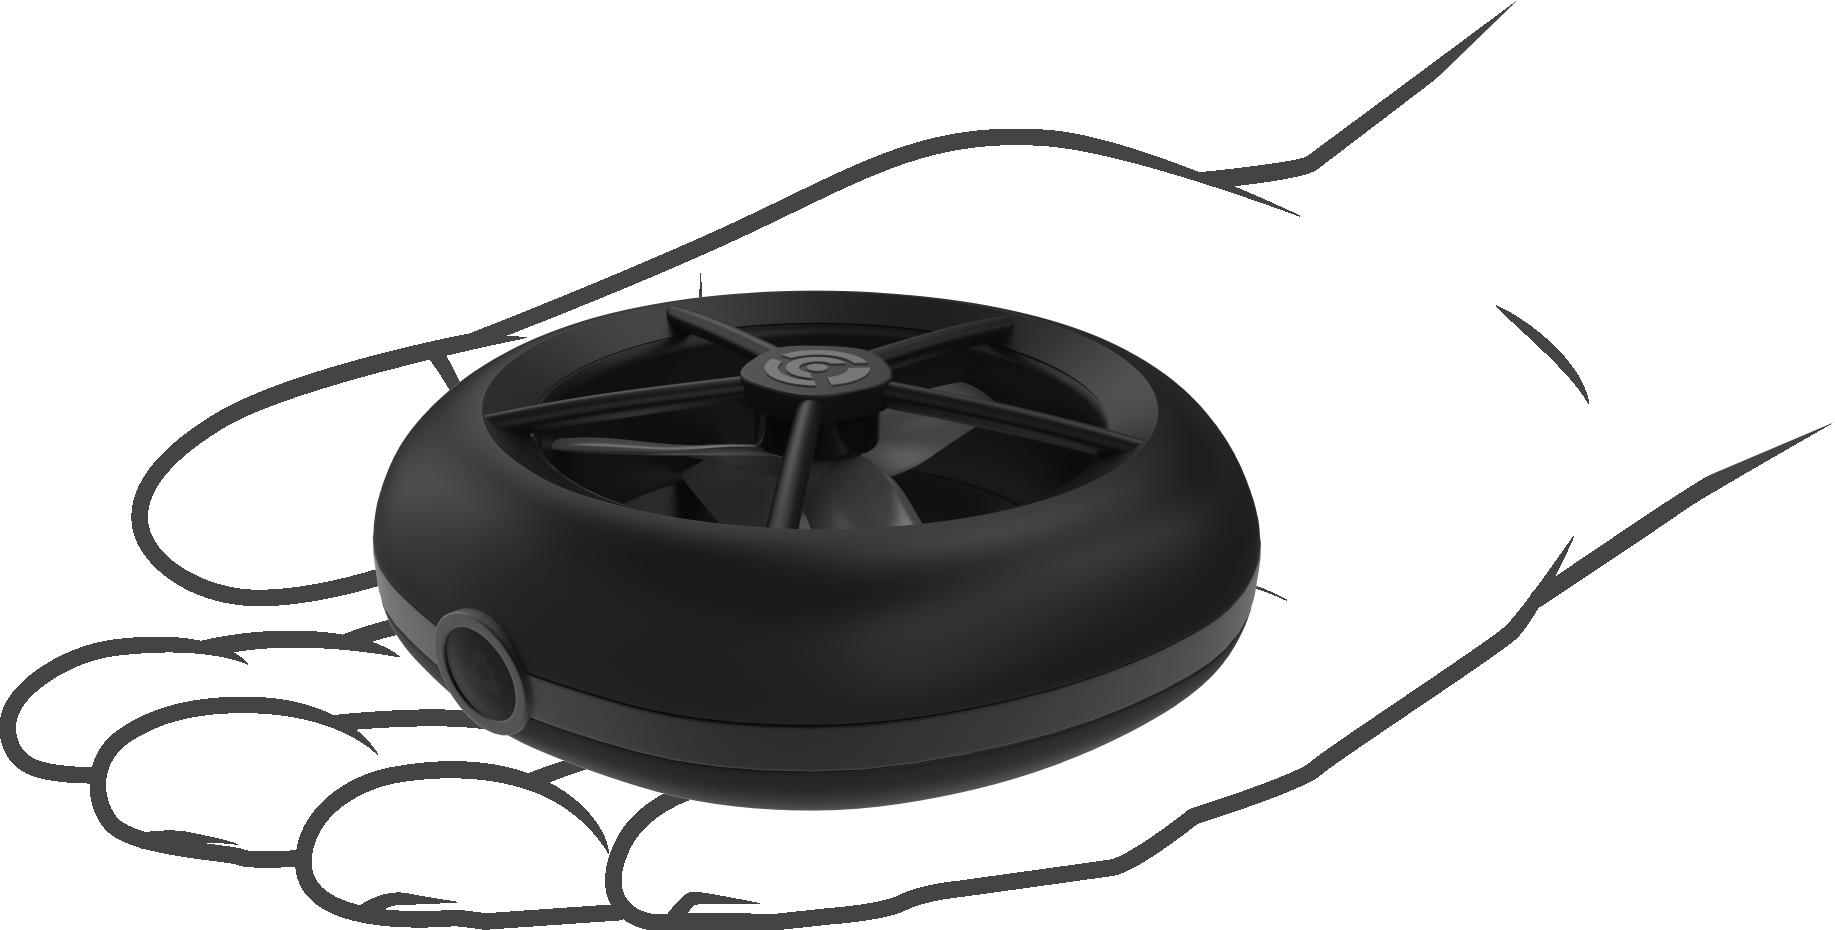 200g以下で軽量・安全!セルフィードローン「Cleo drone」が登場